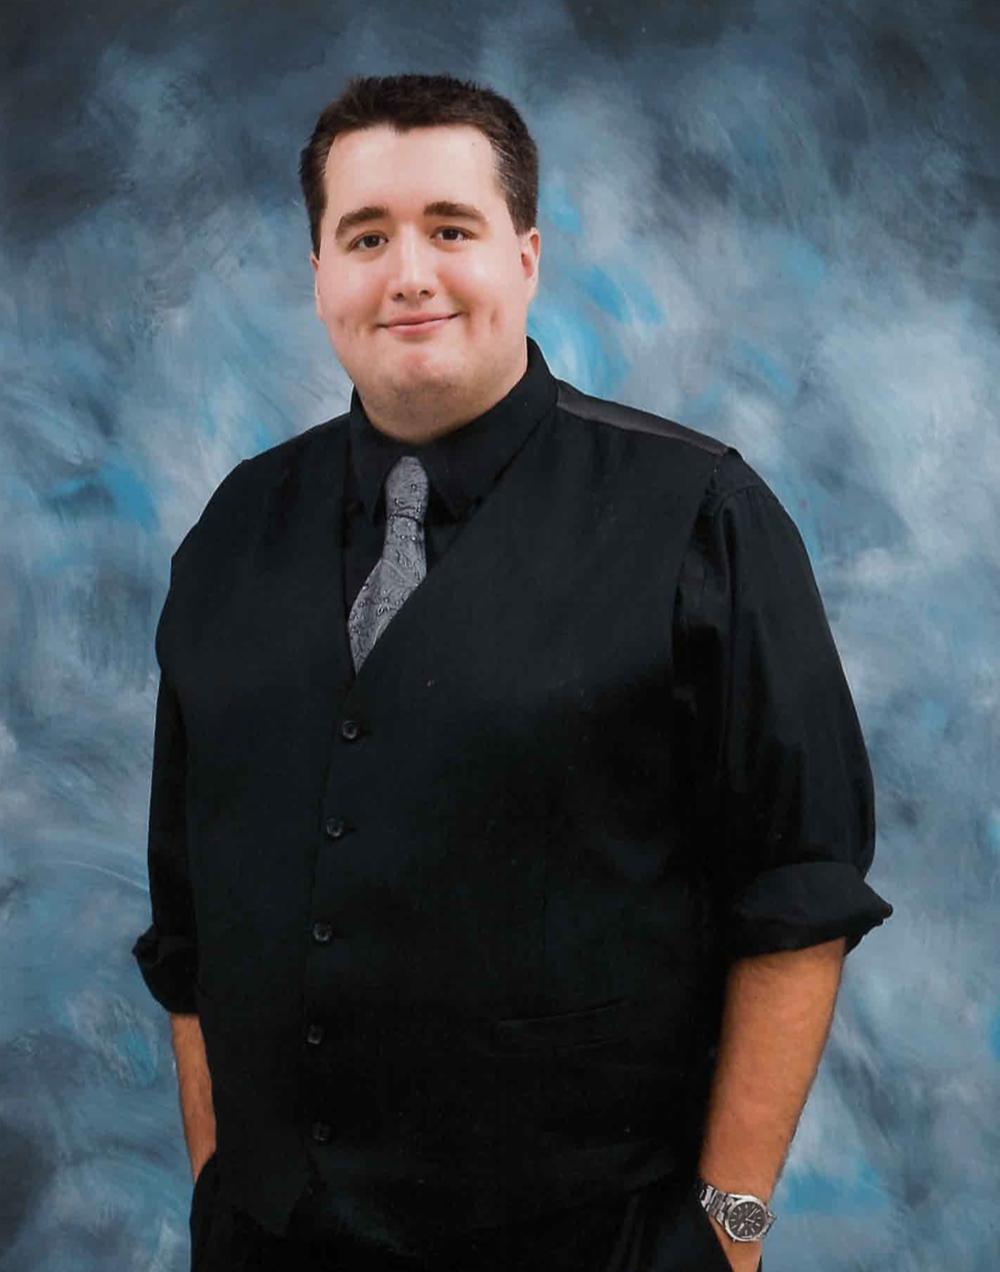 Andrew Klingsick, Barton Middle School, Buda, Texas